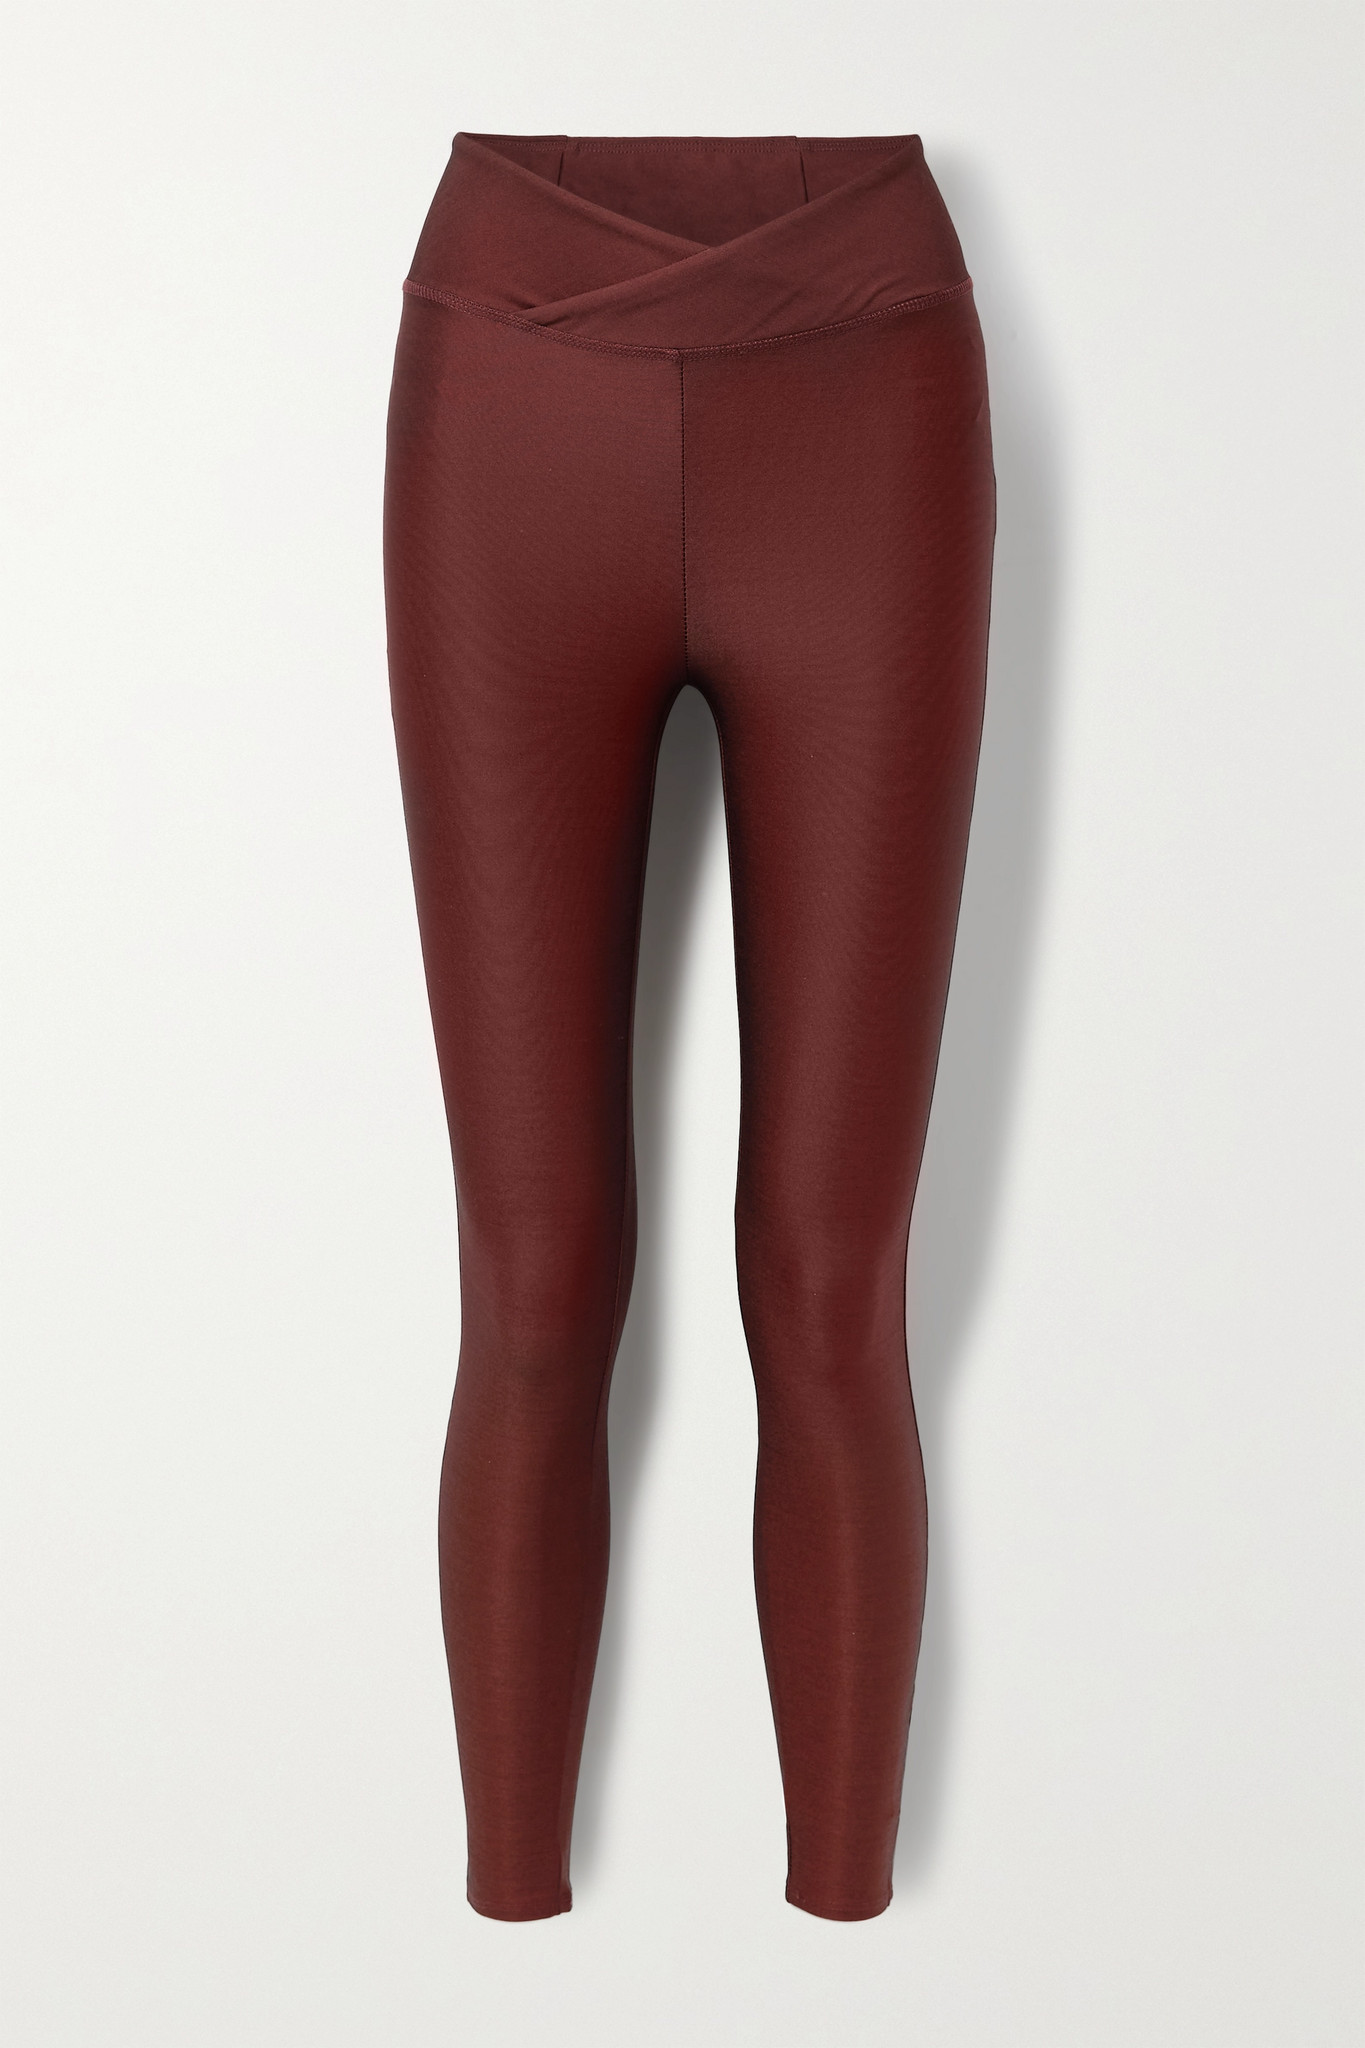 TWENTY MONTRÉAL - Colorsphere Stretch Leggings - Red - medium